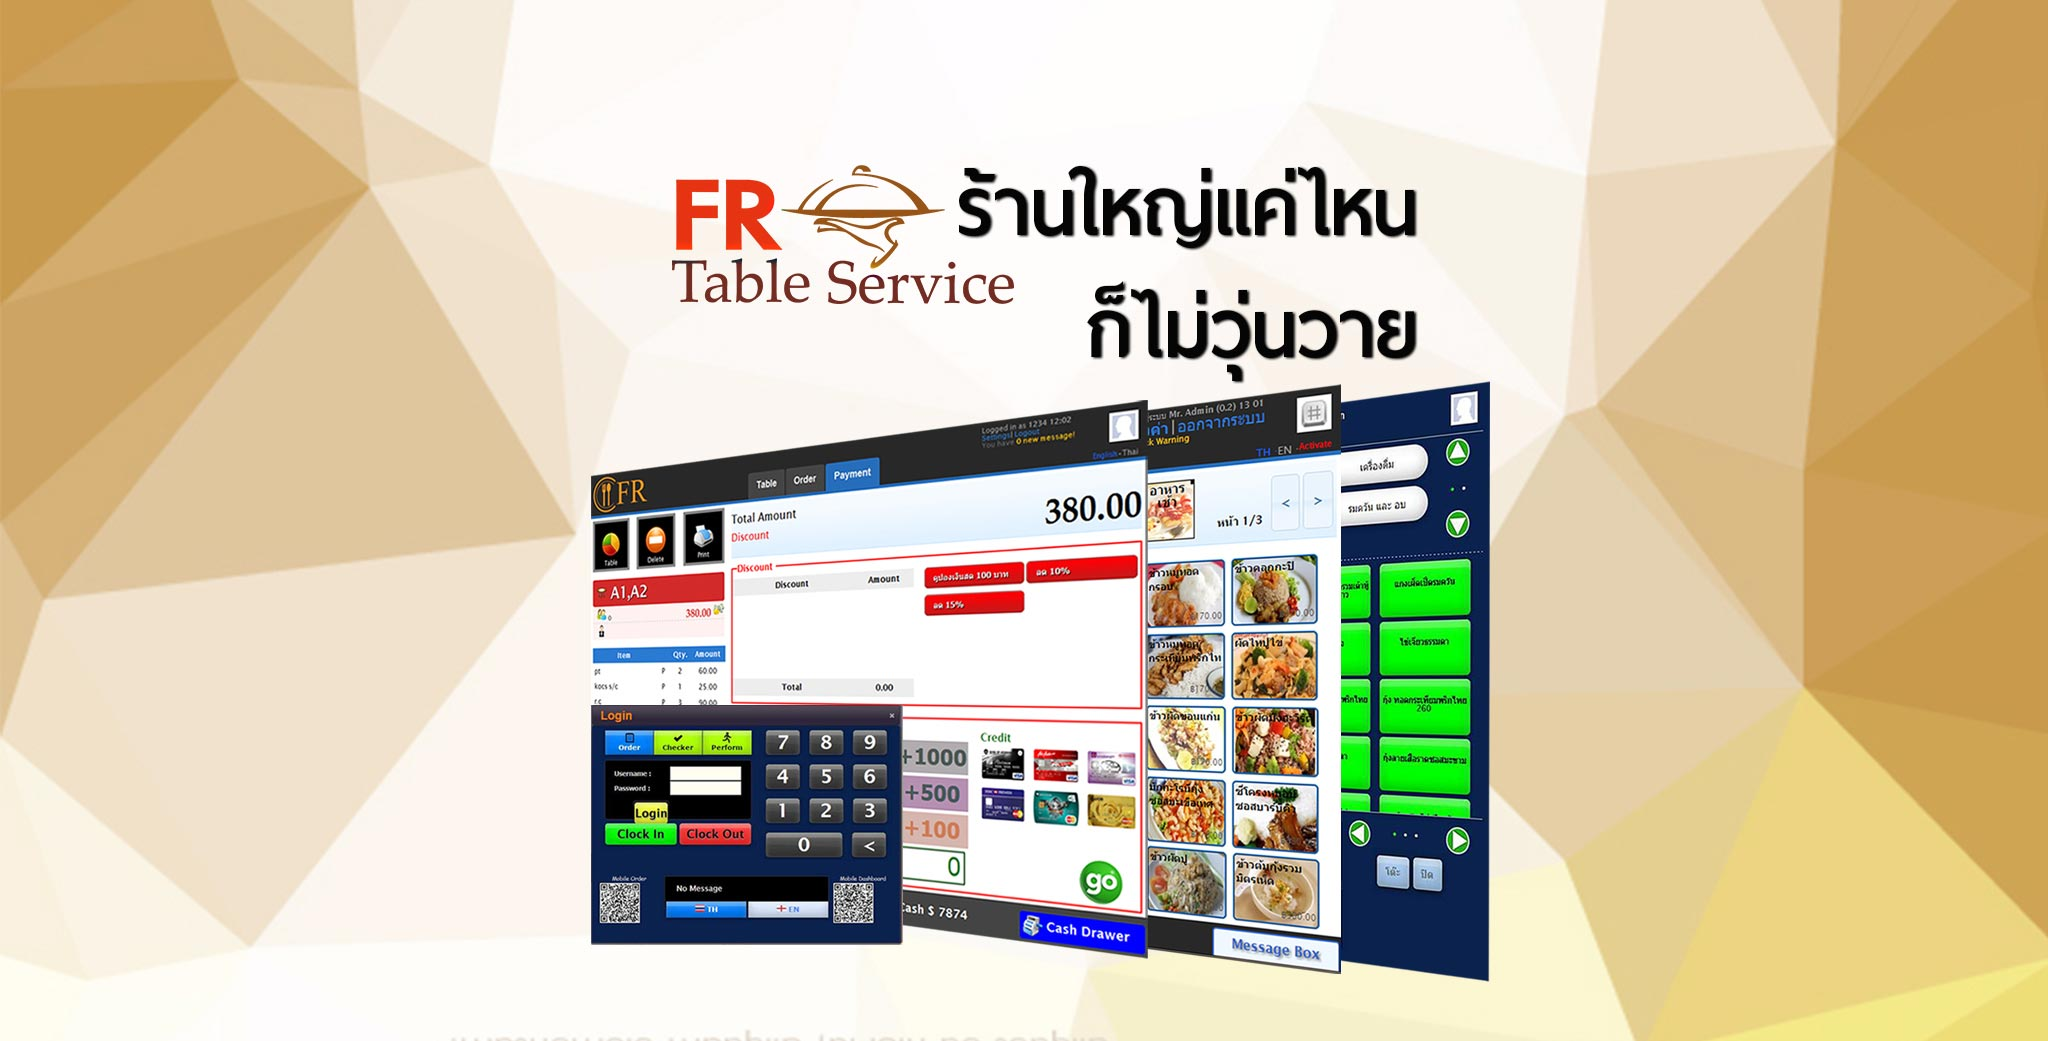 FR TABLE SERVICE สำหรับร้านอาหารขนาดใหญ่